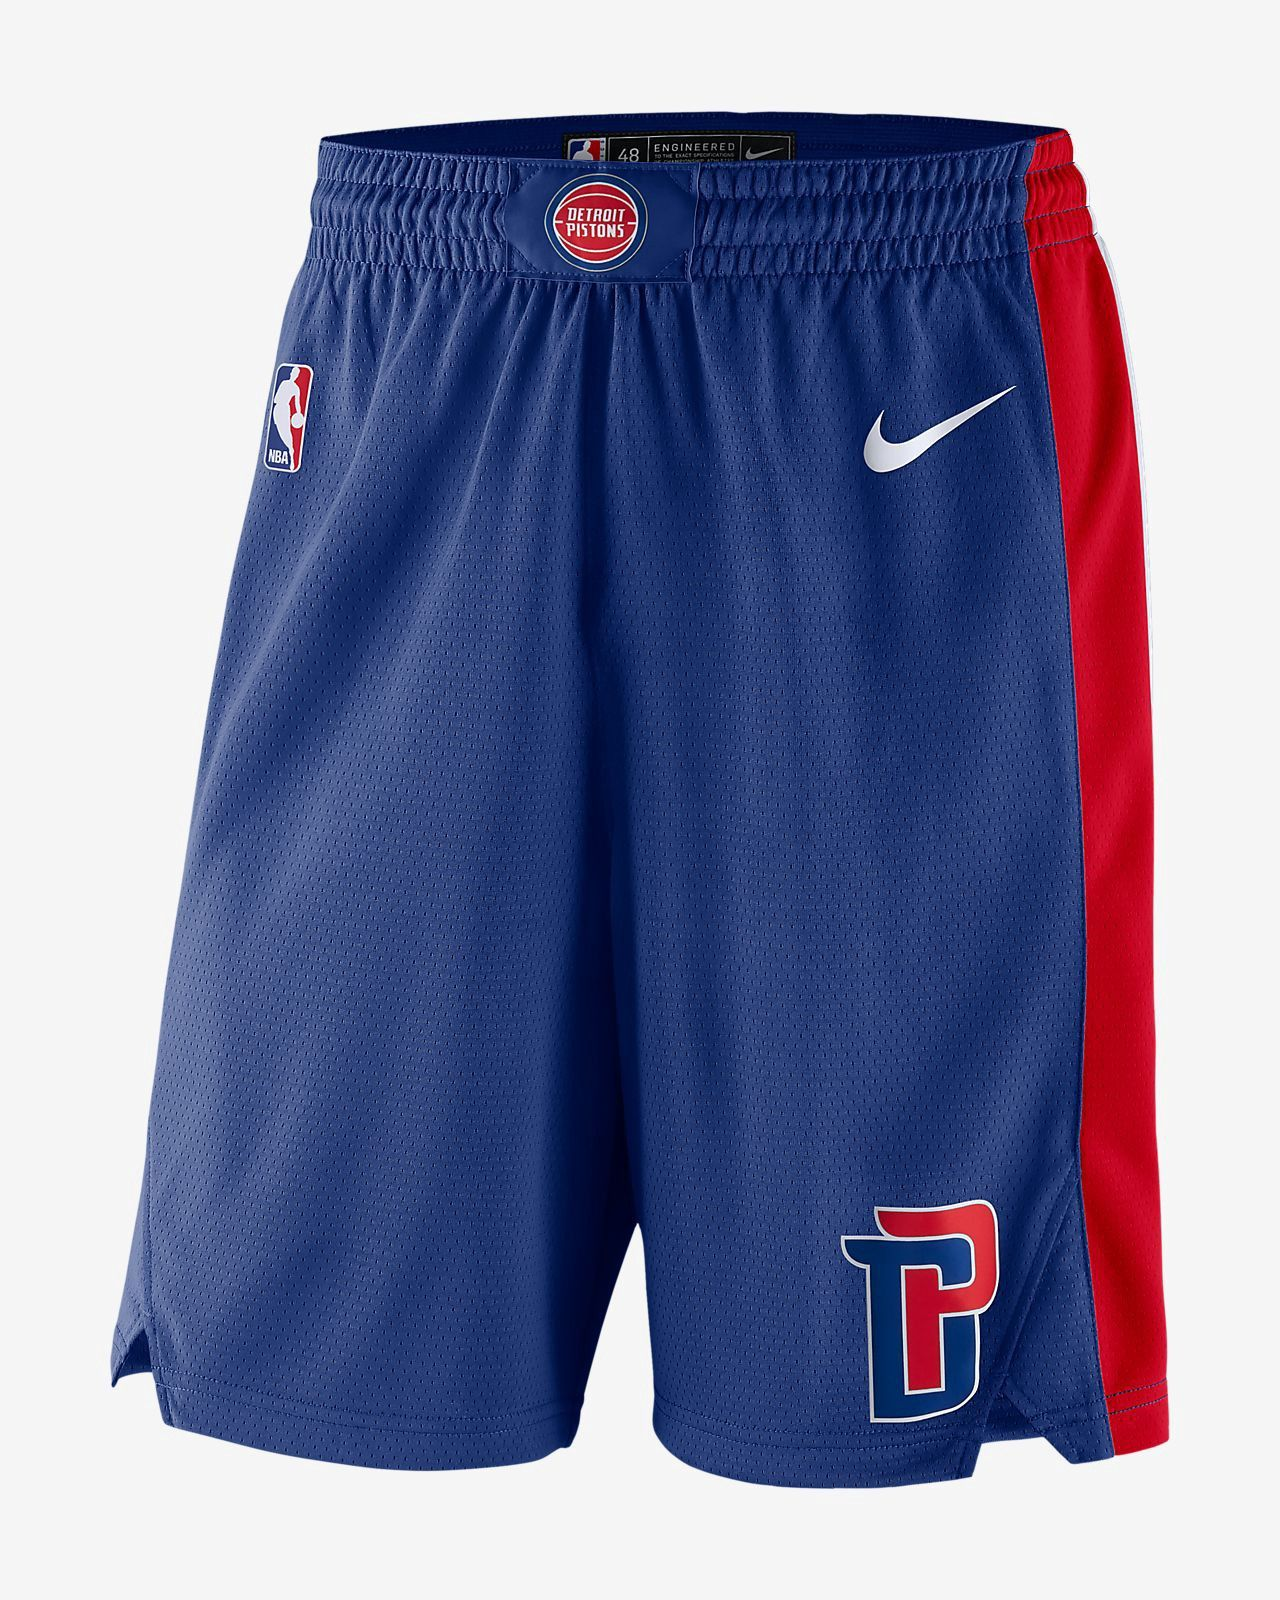 37c9efacf Nike Detroit Pistons Icon Edition Swingman Men s Nba Shorts - 2XL ...